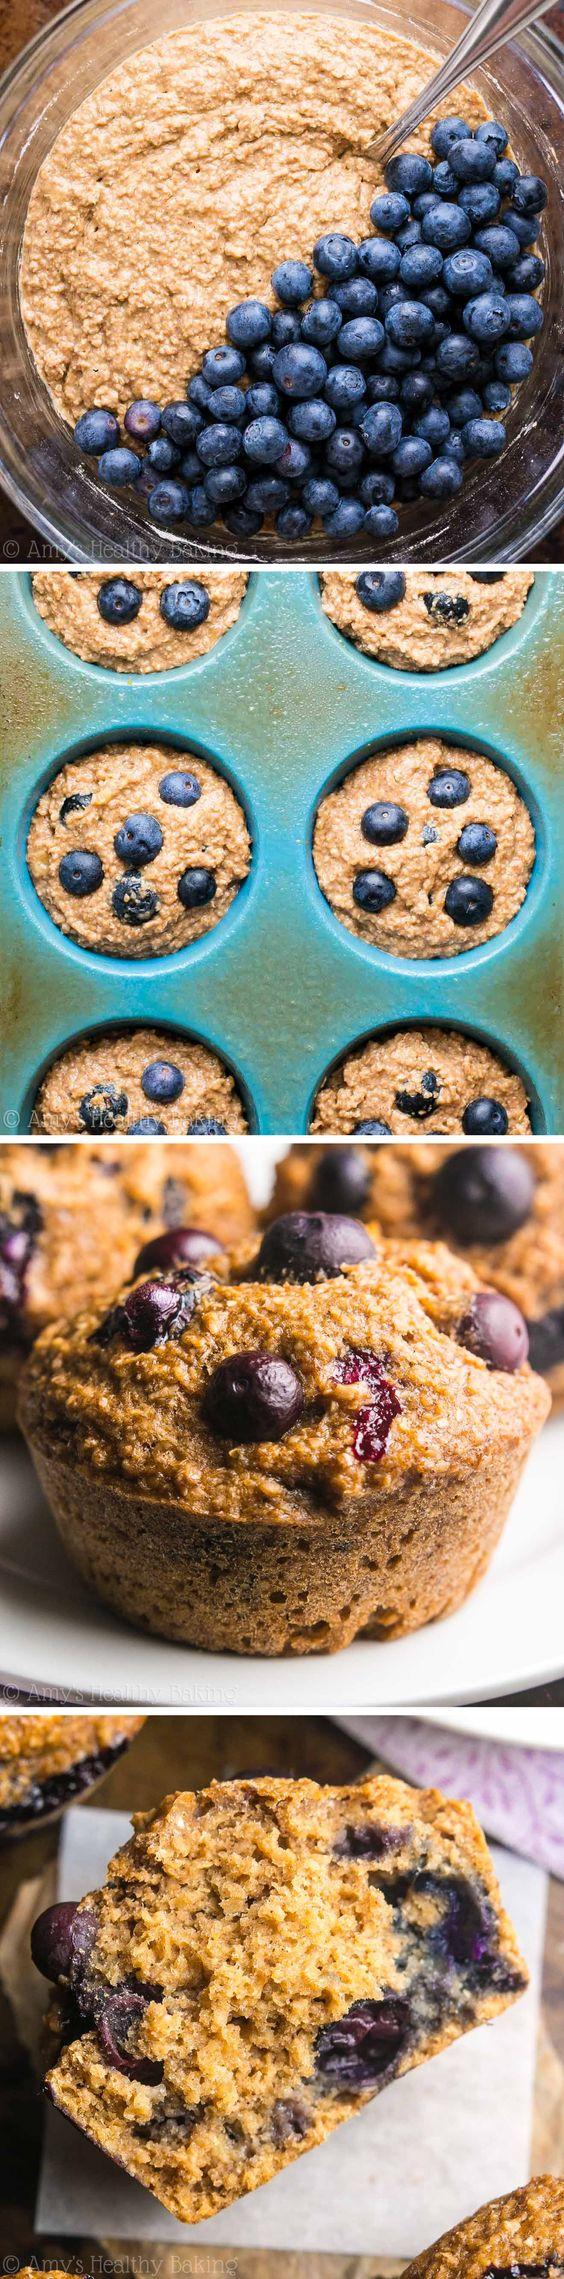 Banana bran muffins, Bran muffins and Muffins on Pinterest